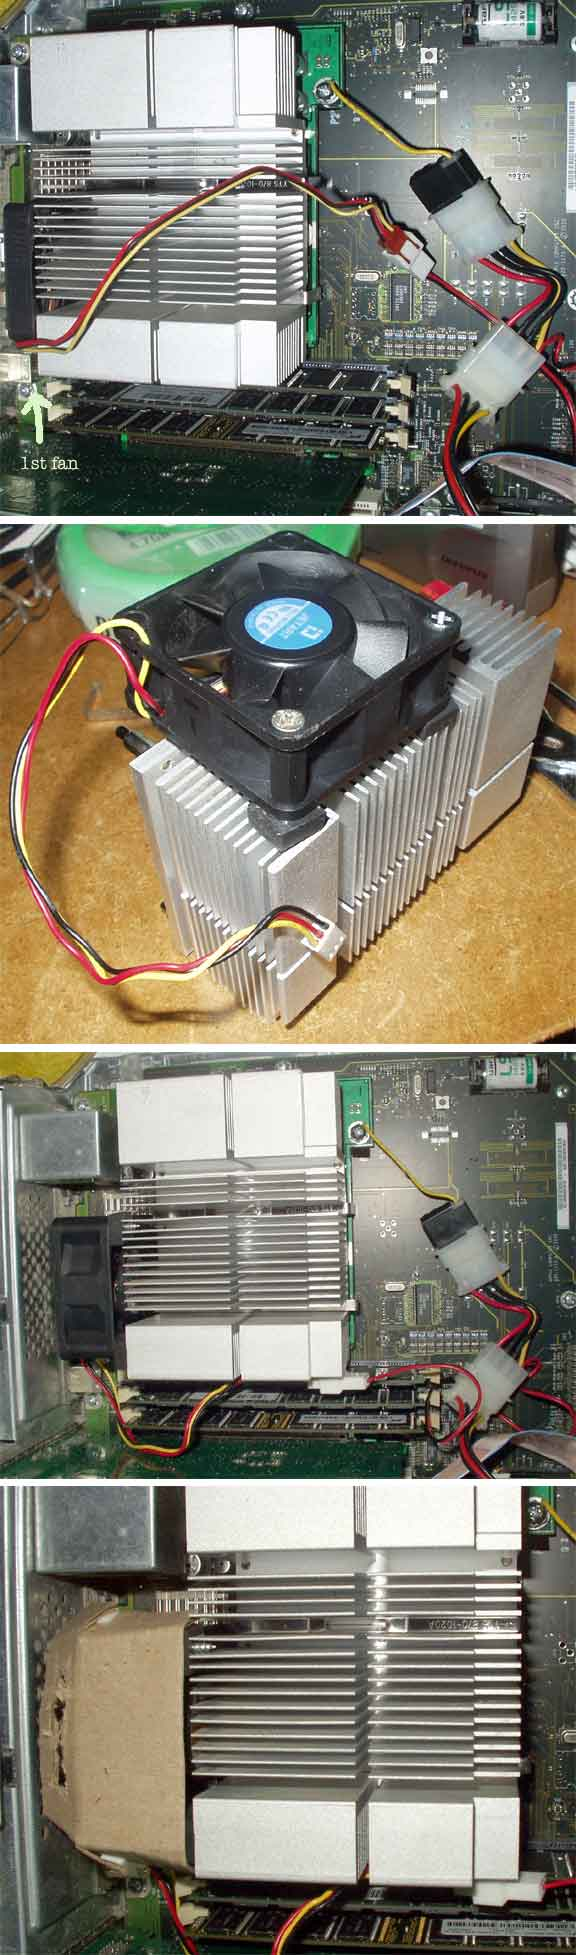 QS processor installed in DA